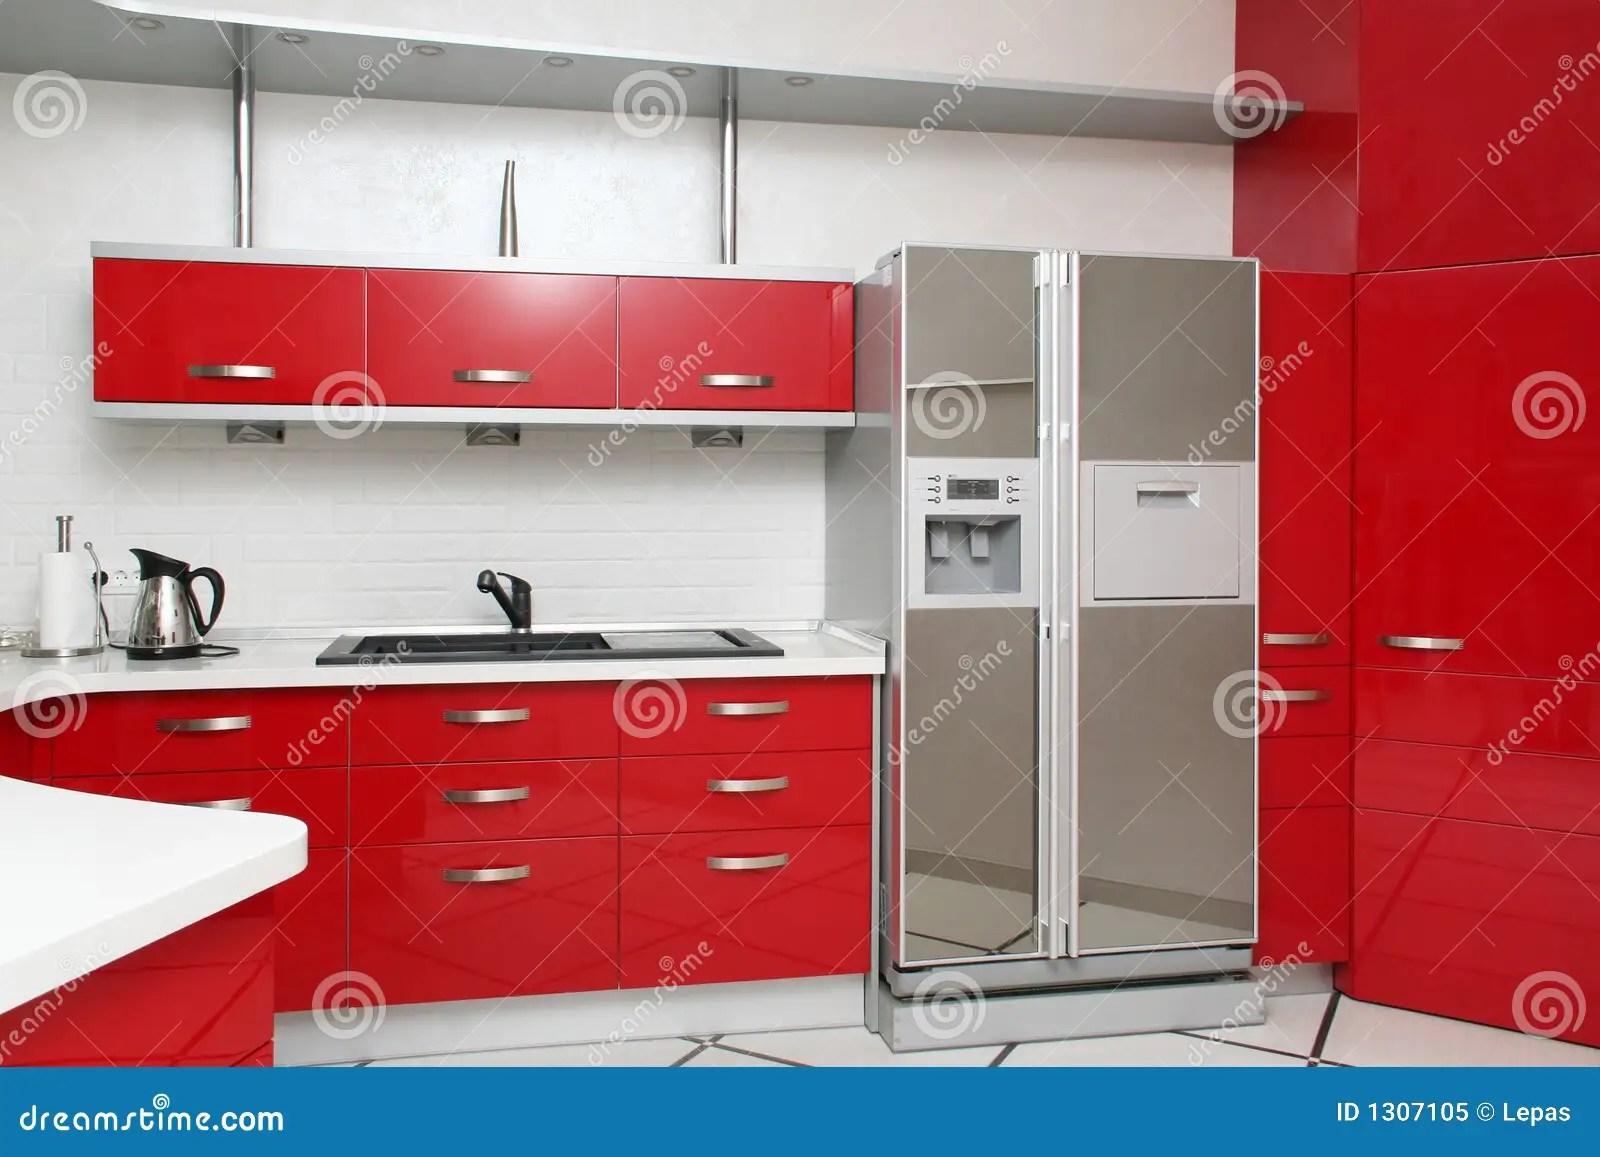 Cucina Scavolini Rossa   Cucina Moderna Rossa Immagine Stock ...